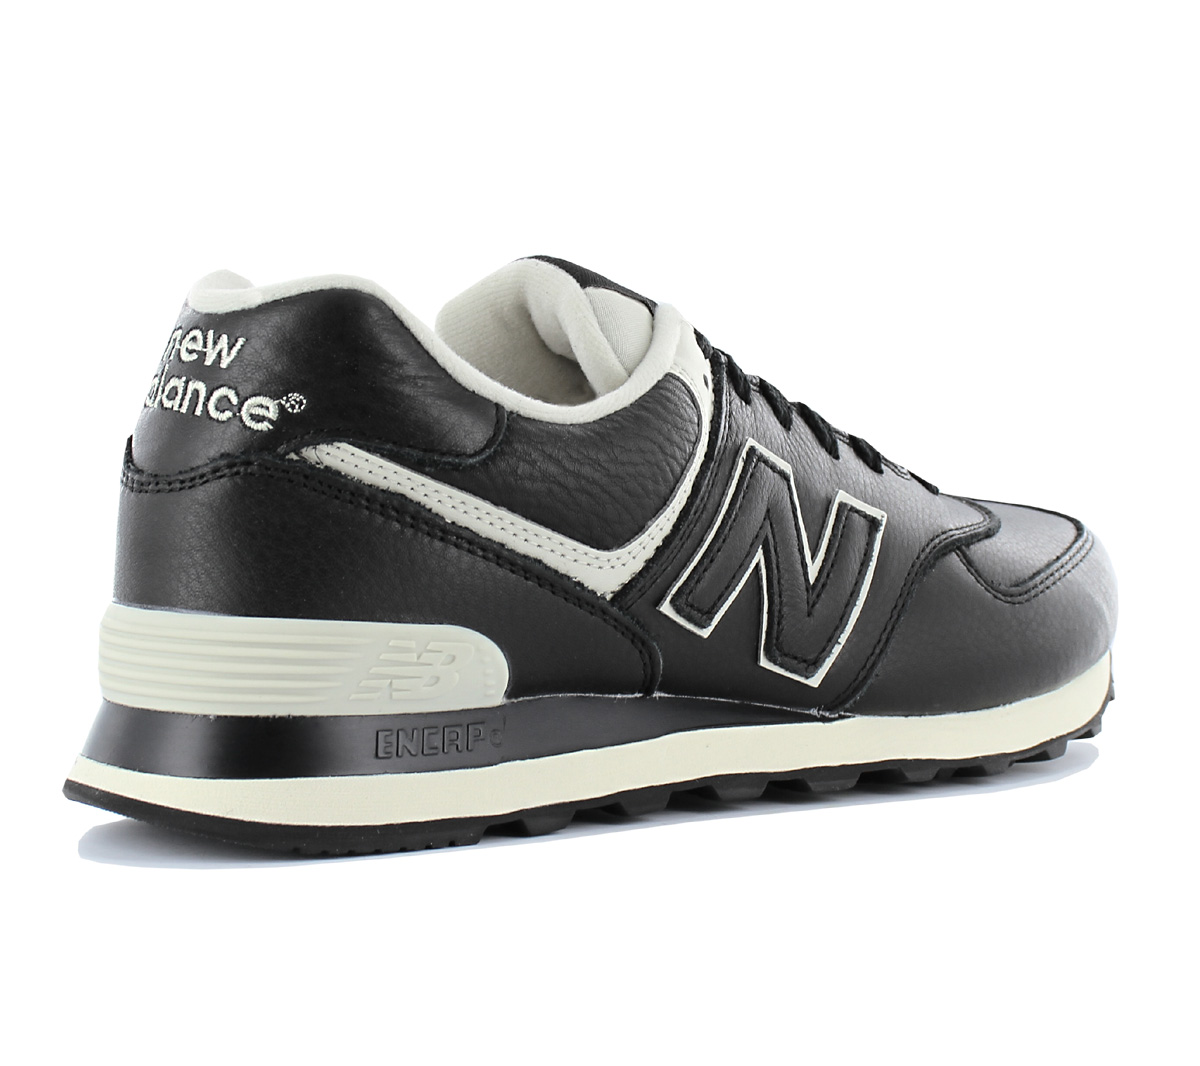 new balance classic 574 leder herren sneaker schuhe. Black Bedroom Furniture Sets. Home Design Ideas